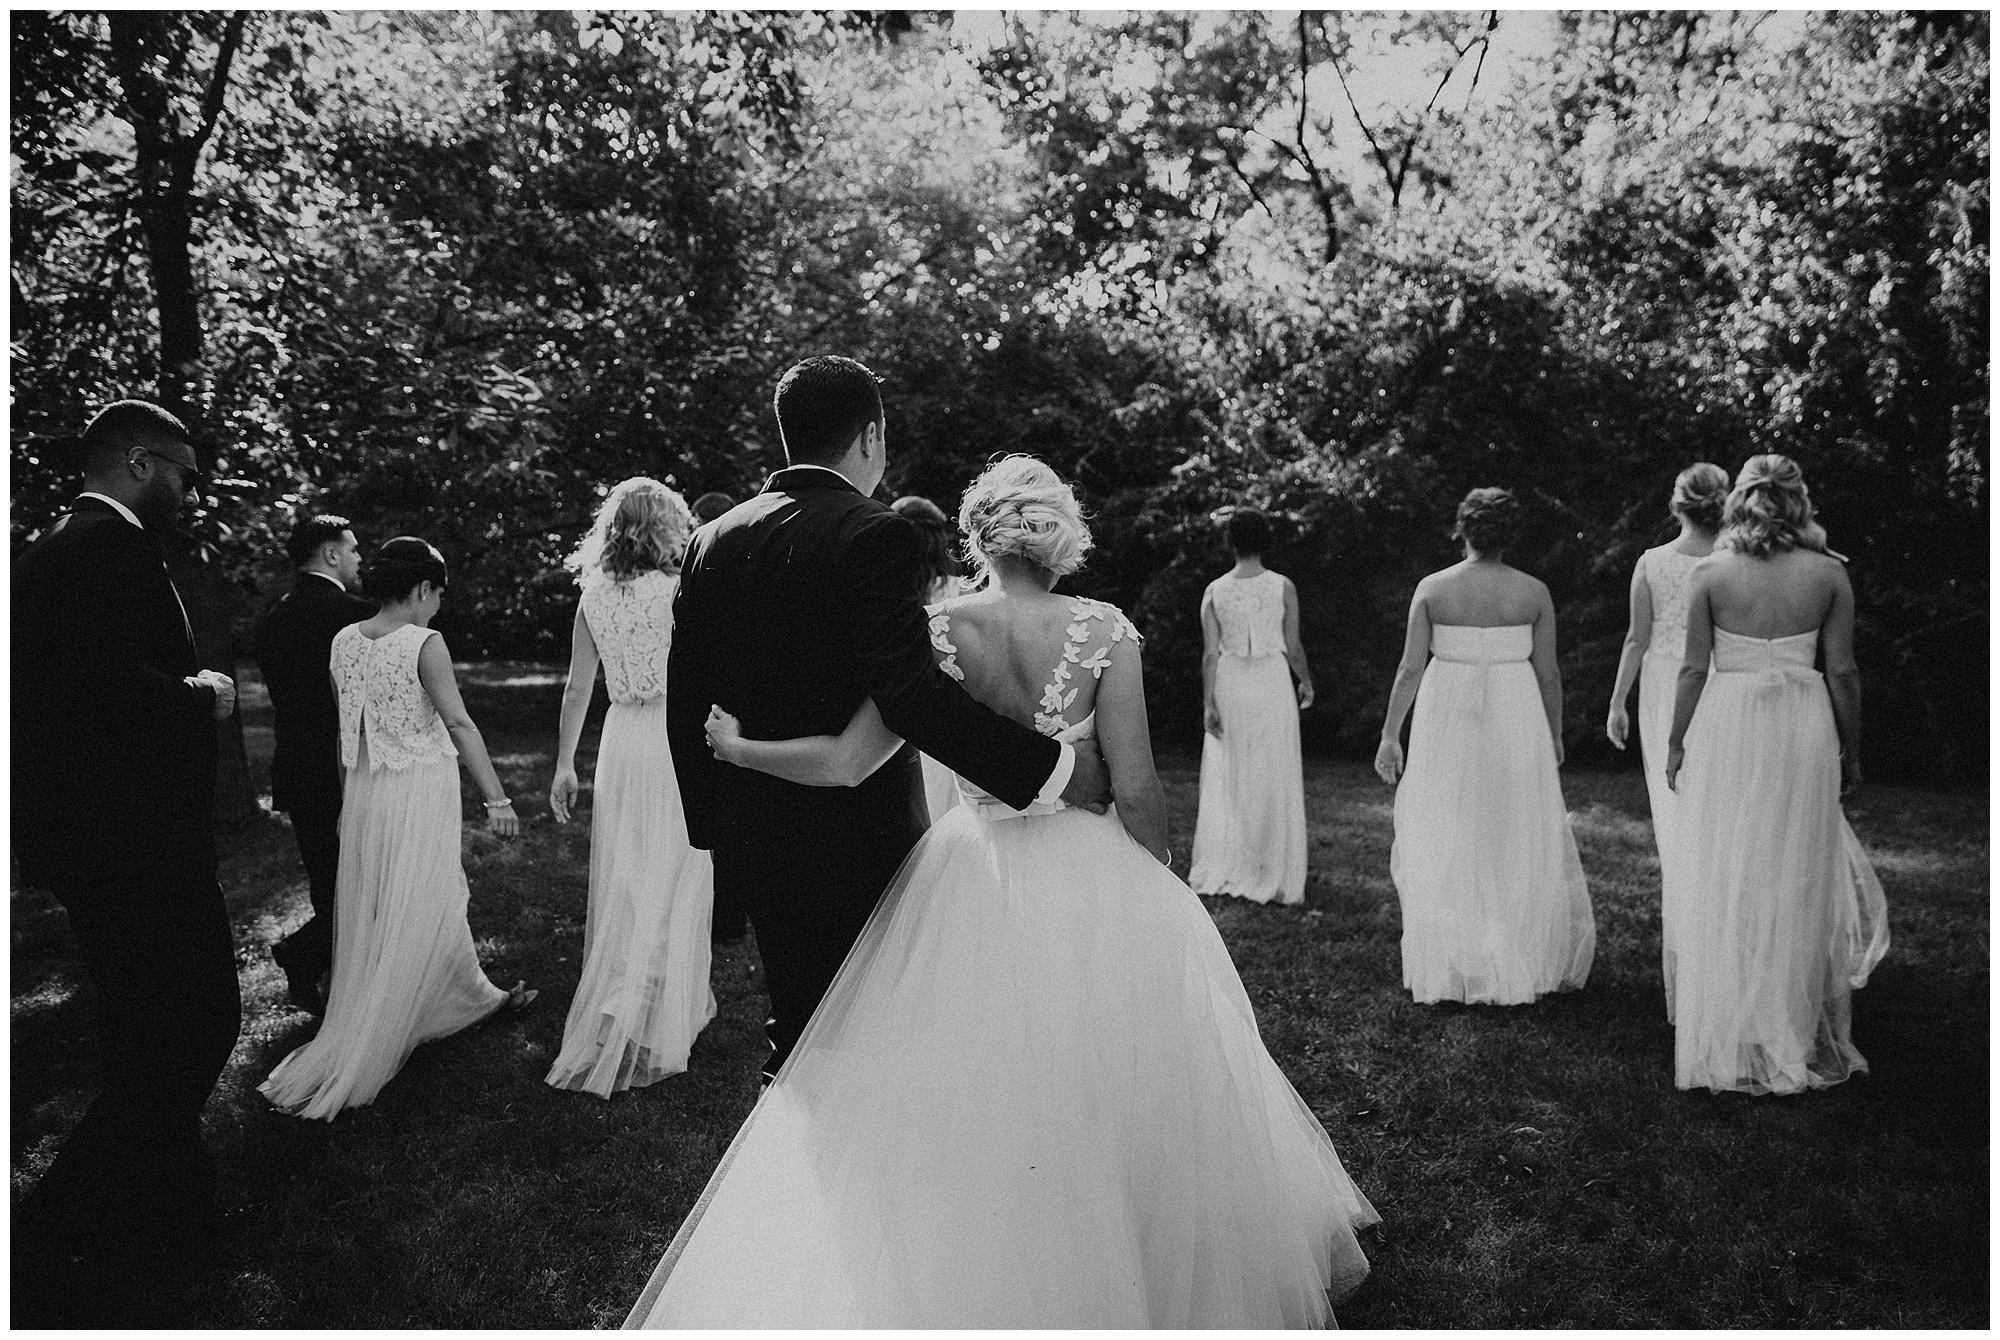 pear_tree_estate_wedding_champaign_il_wright_photographs_jj_0043.jpg